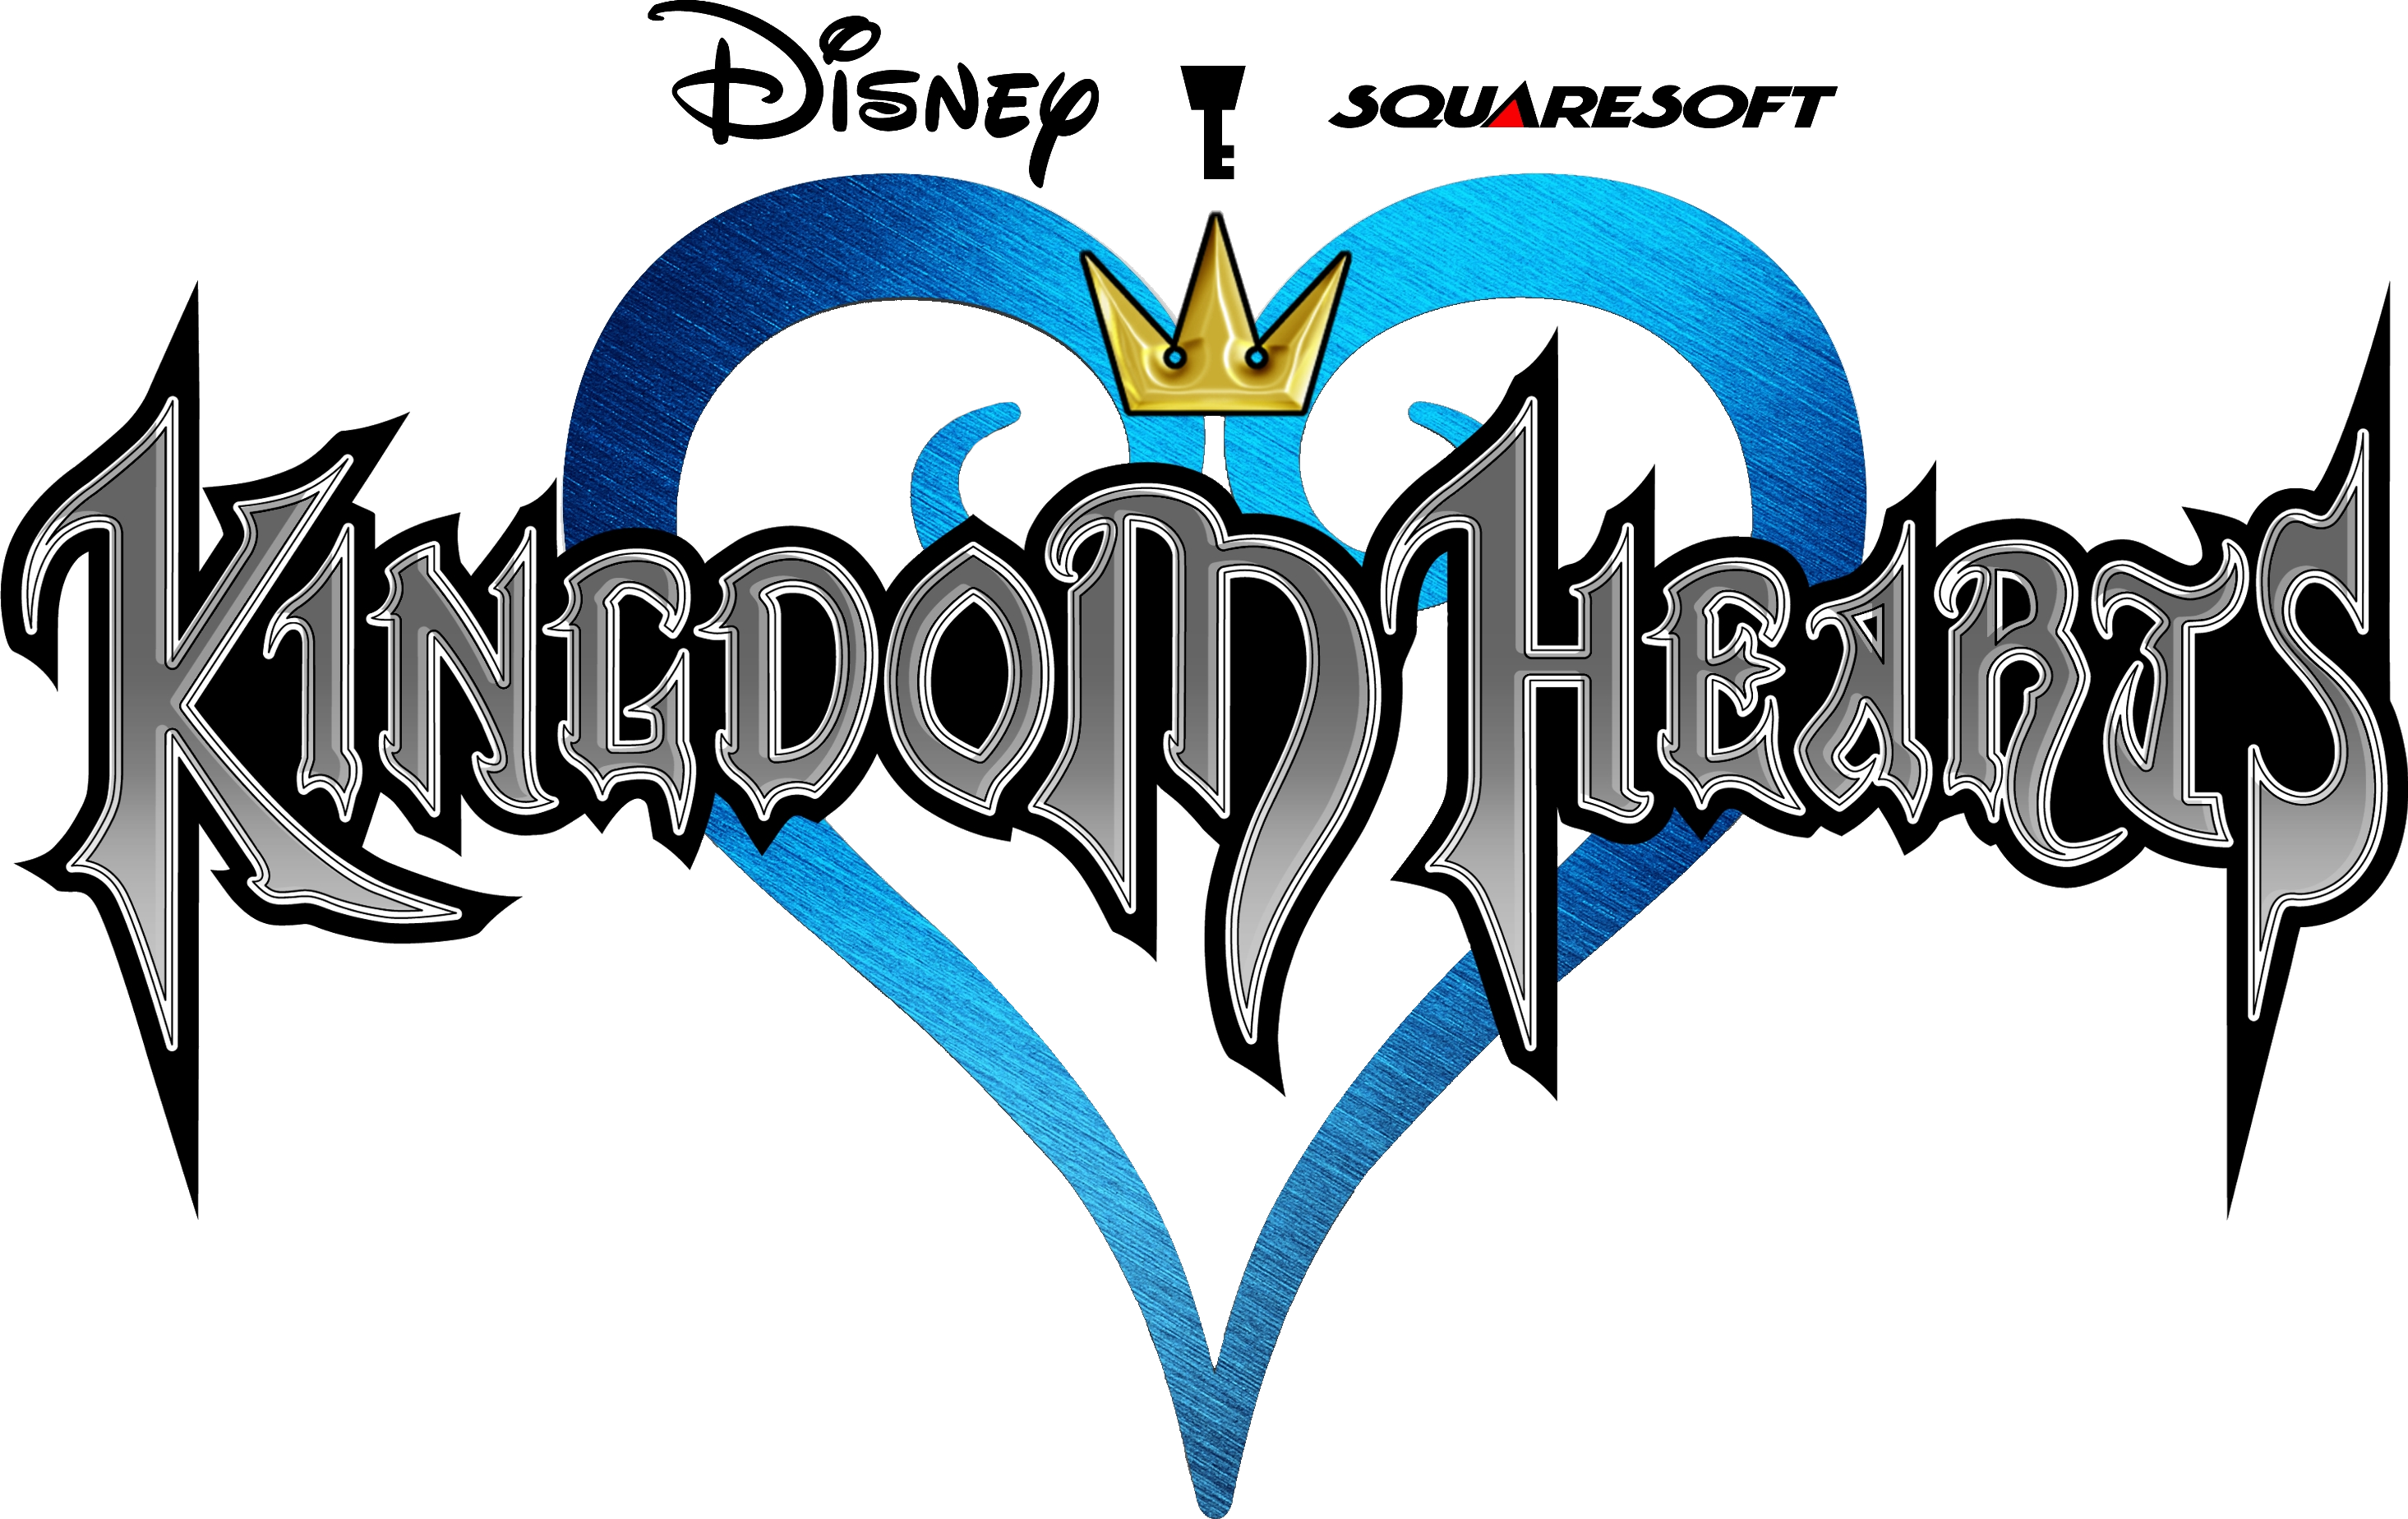 Kingdom Hearts Juego Kingdom Hearts Wiki Fandom Powered By Wikia